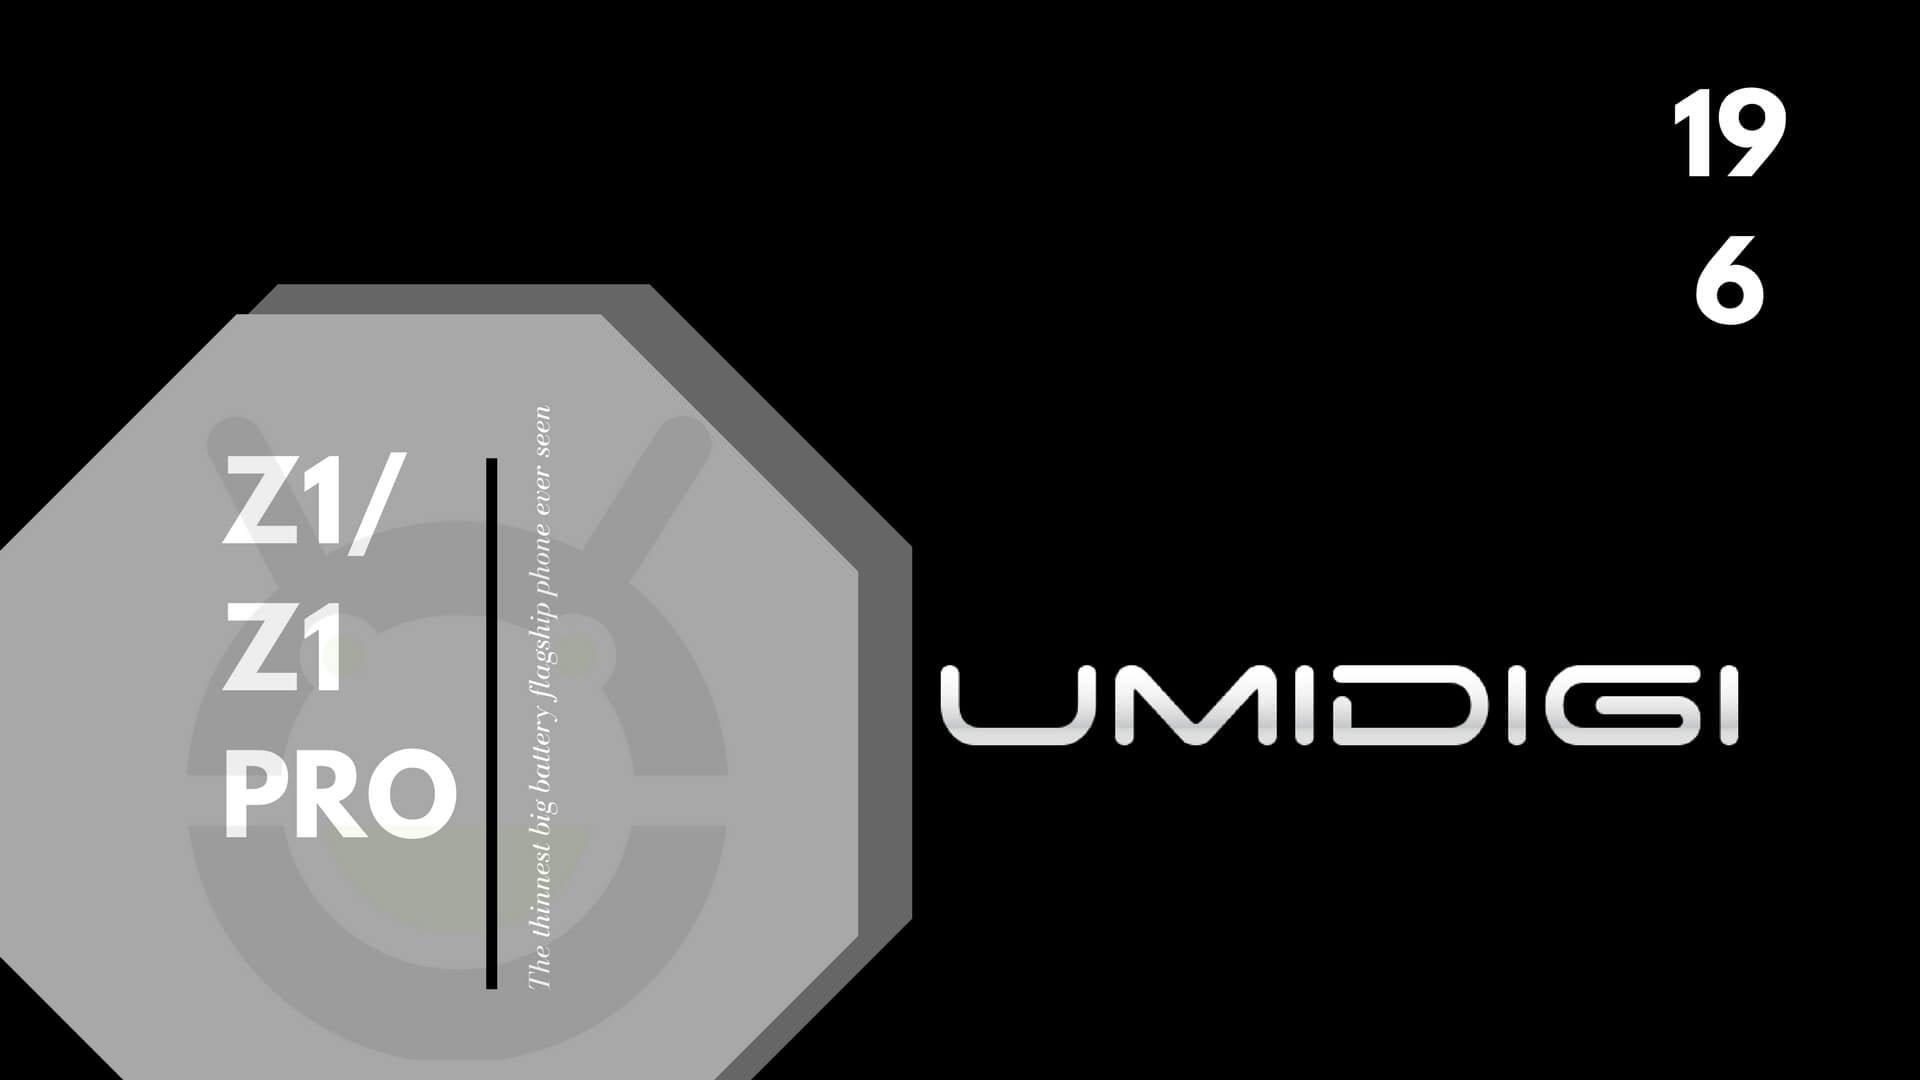 Faktencheck zum UMIDIGI Z1 PRO Release